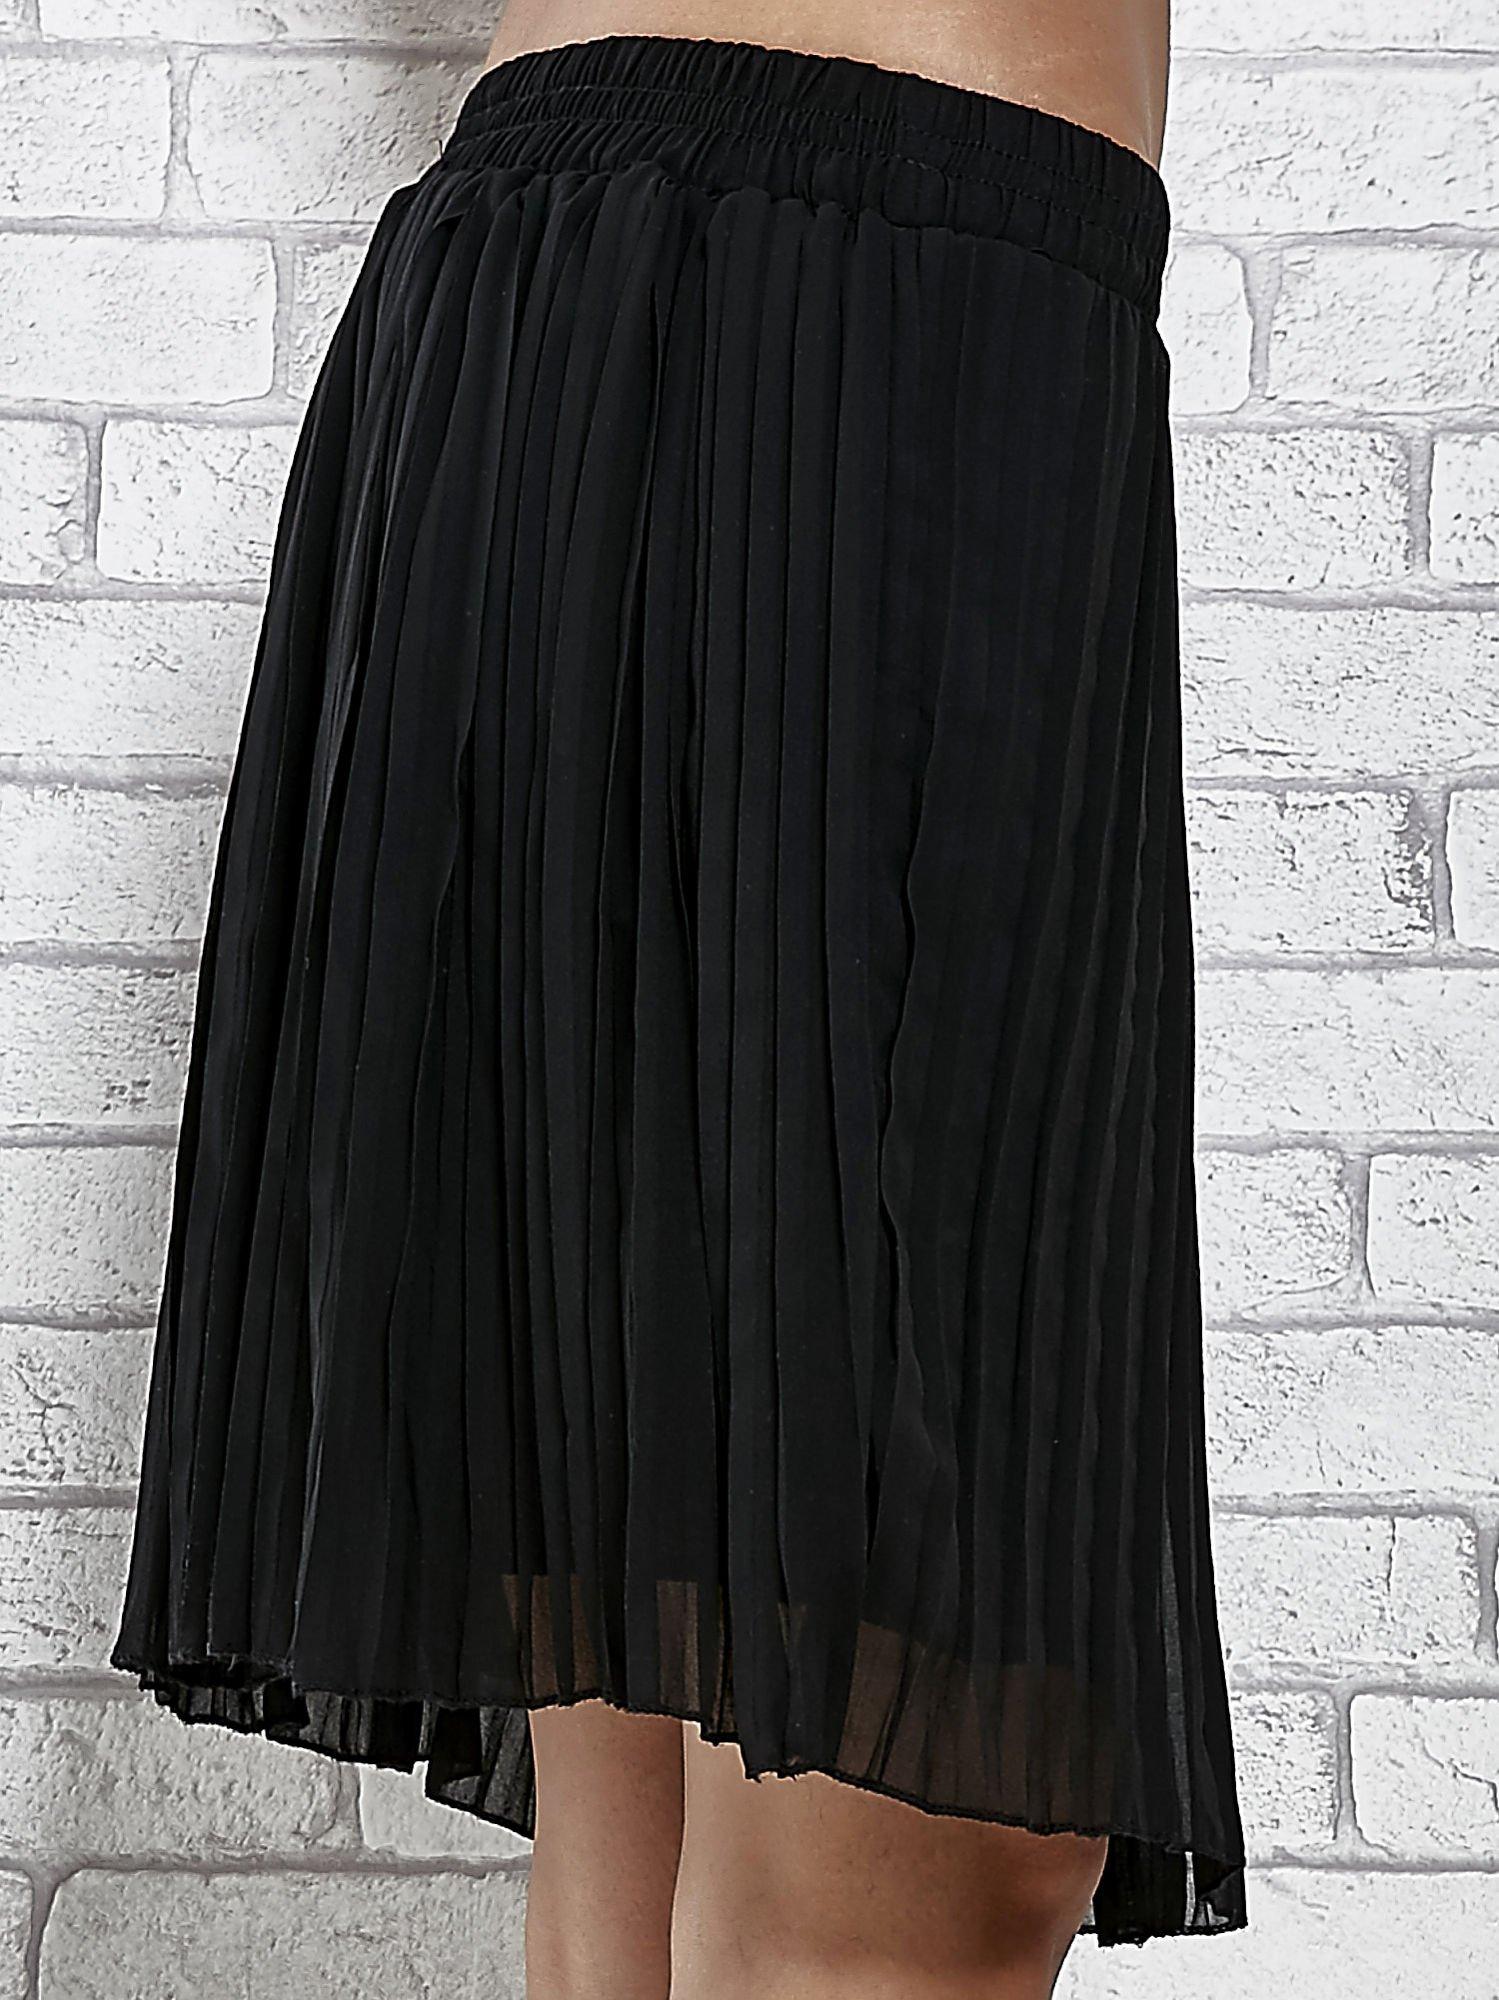 Czarna plisowana spódnica do kolan                                  zdj.                                  4